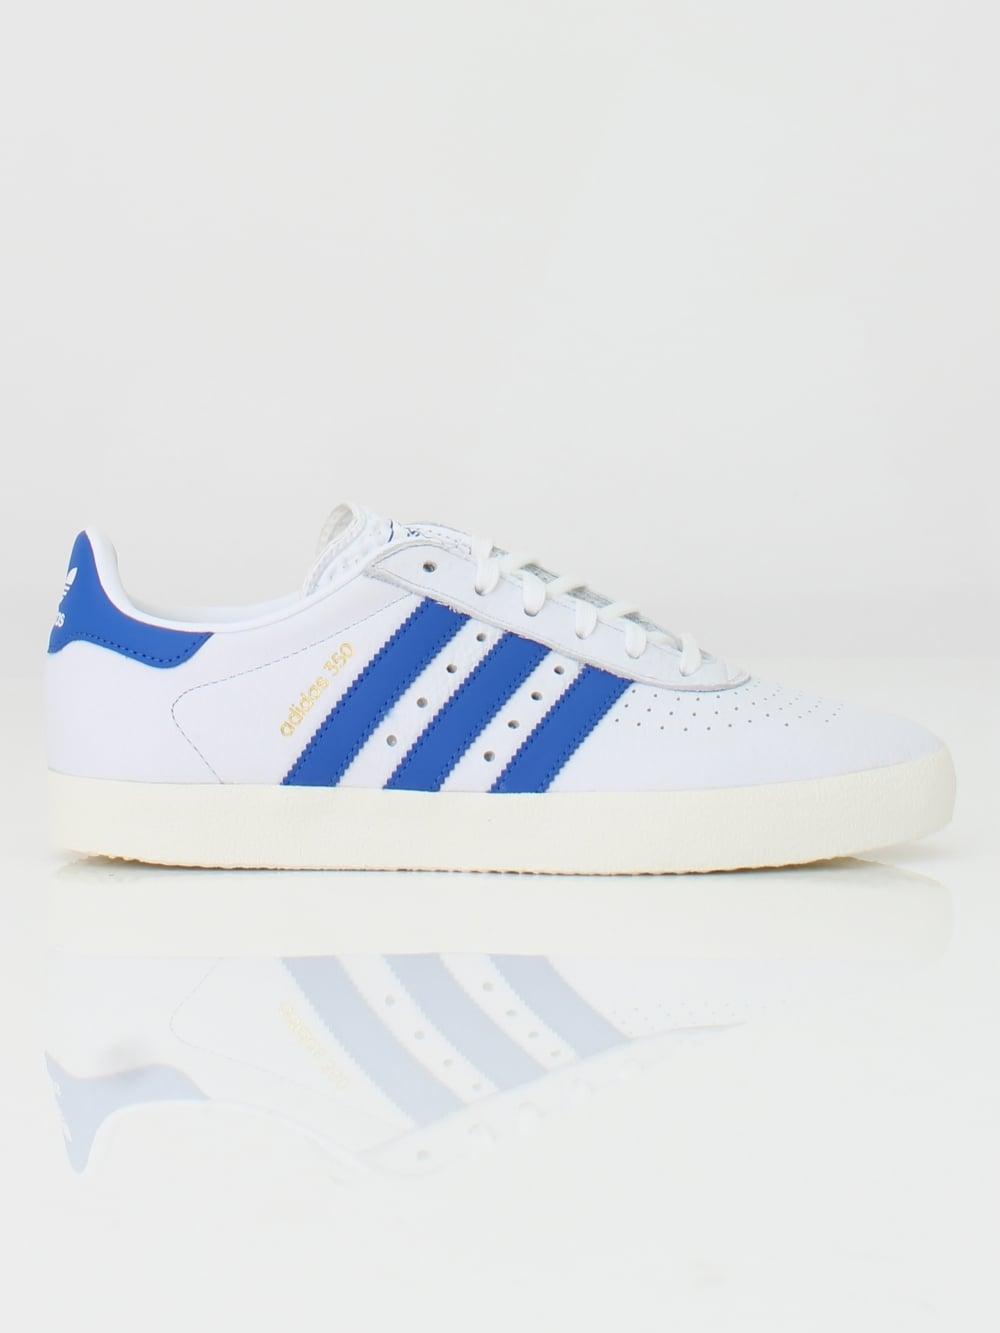 46bb41bfc Adidas Adidas 350 in White